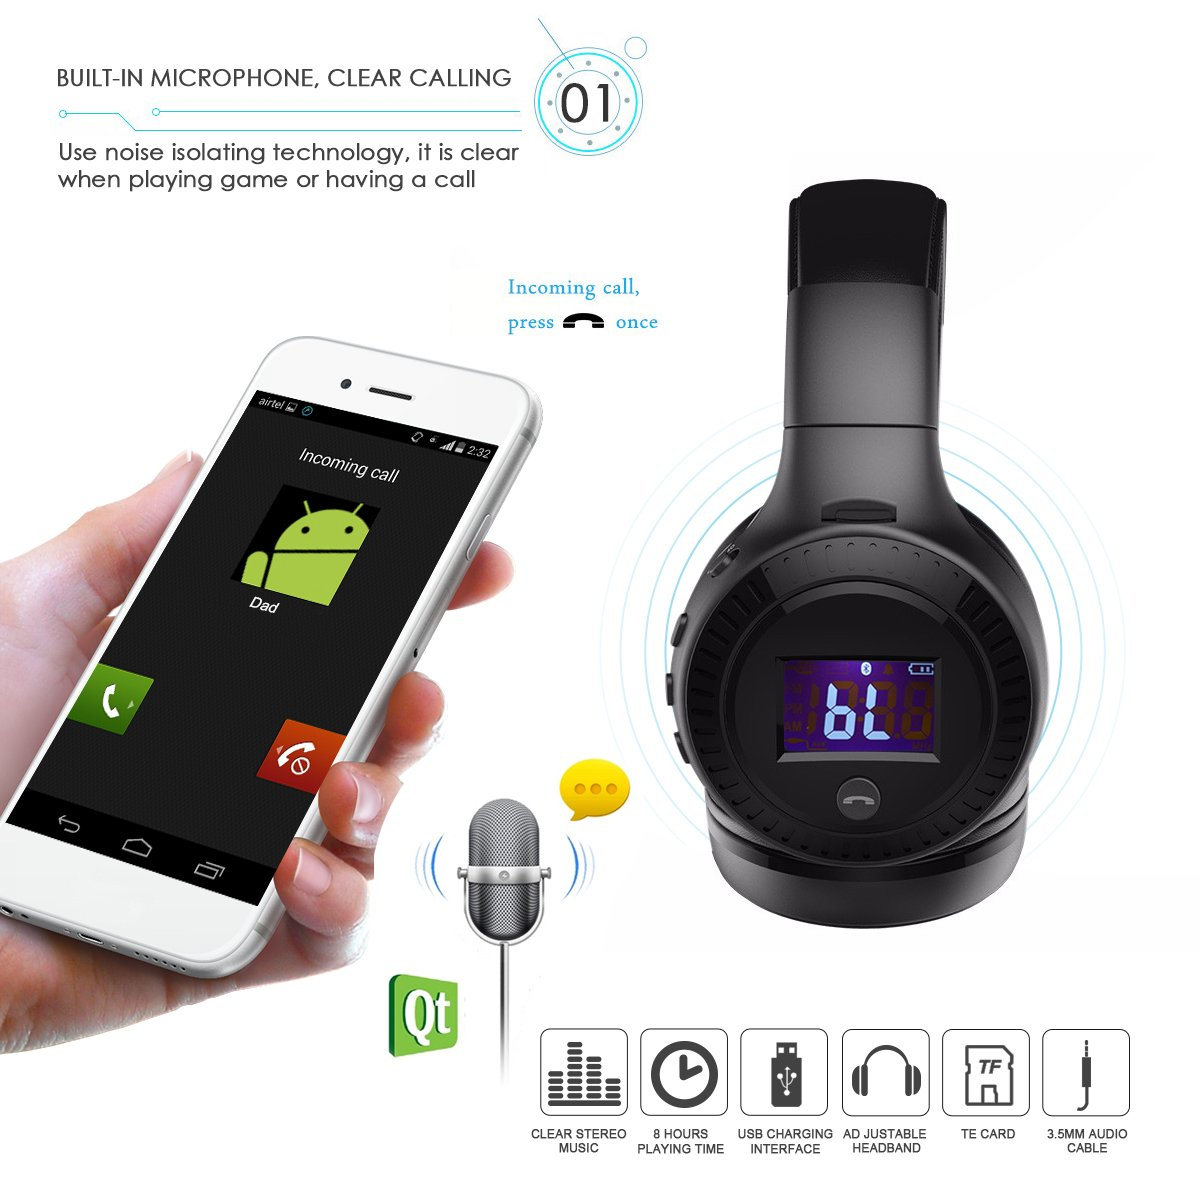 Amazon.com: Wireless Headphones, ELEGIANT On Ear Wireless Headset ...